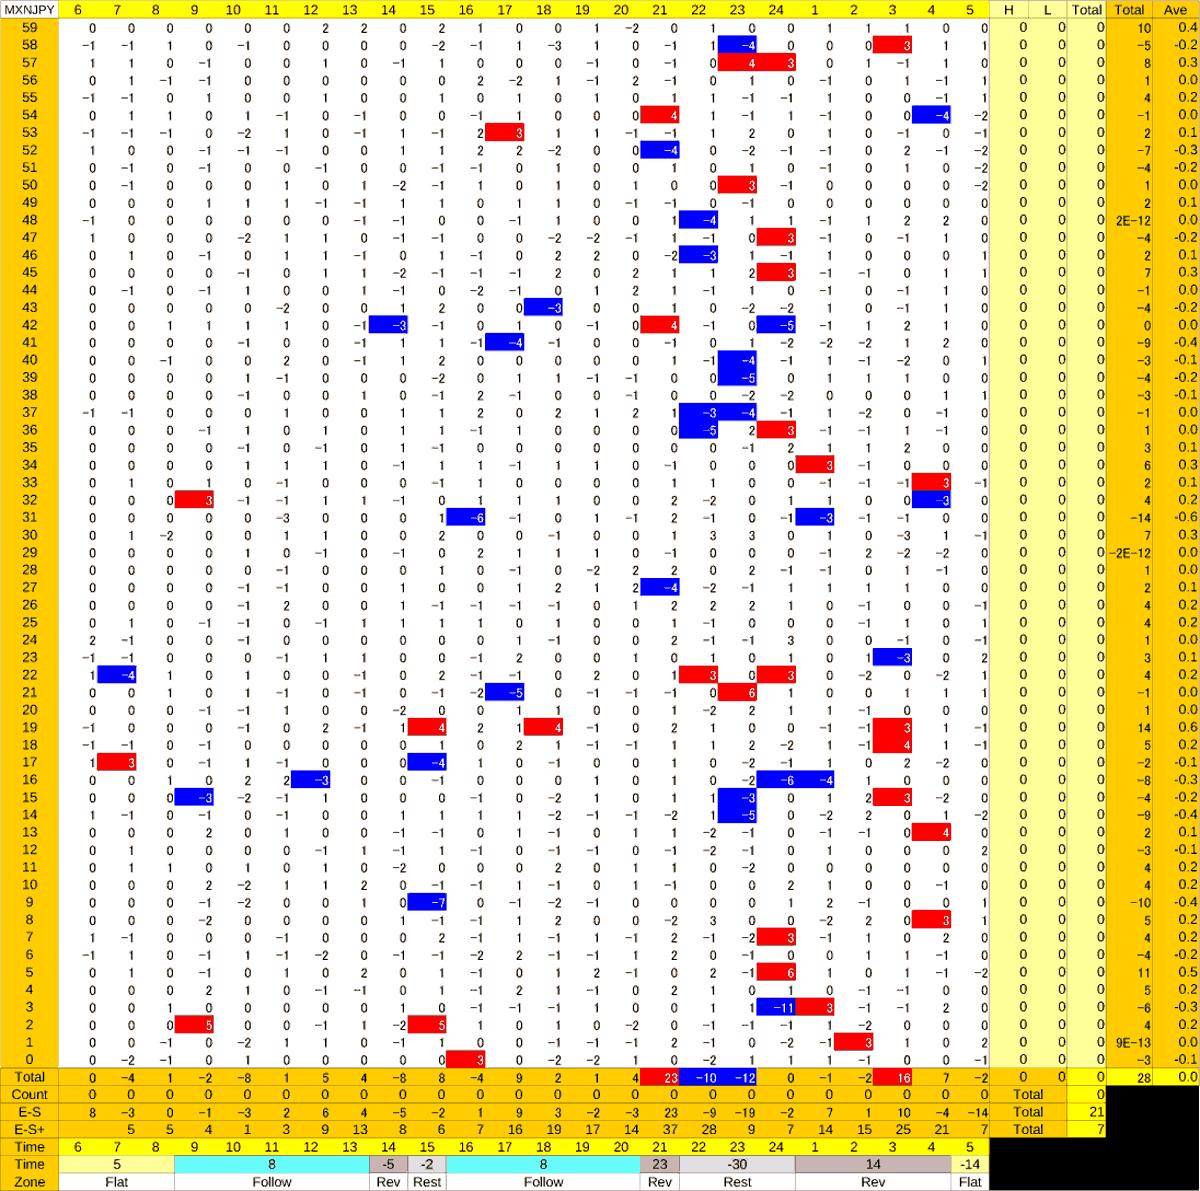 20200709_HS(3)MXNJPY